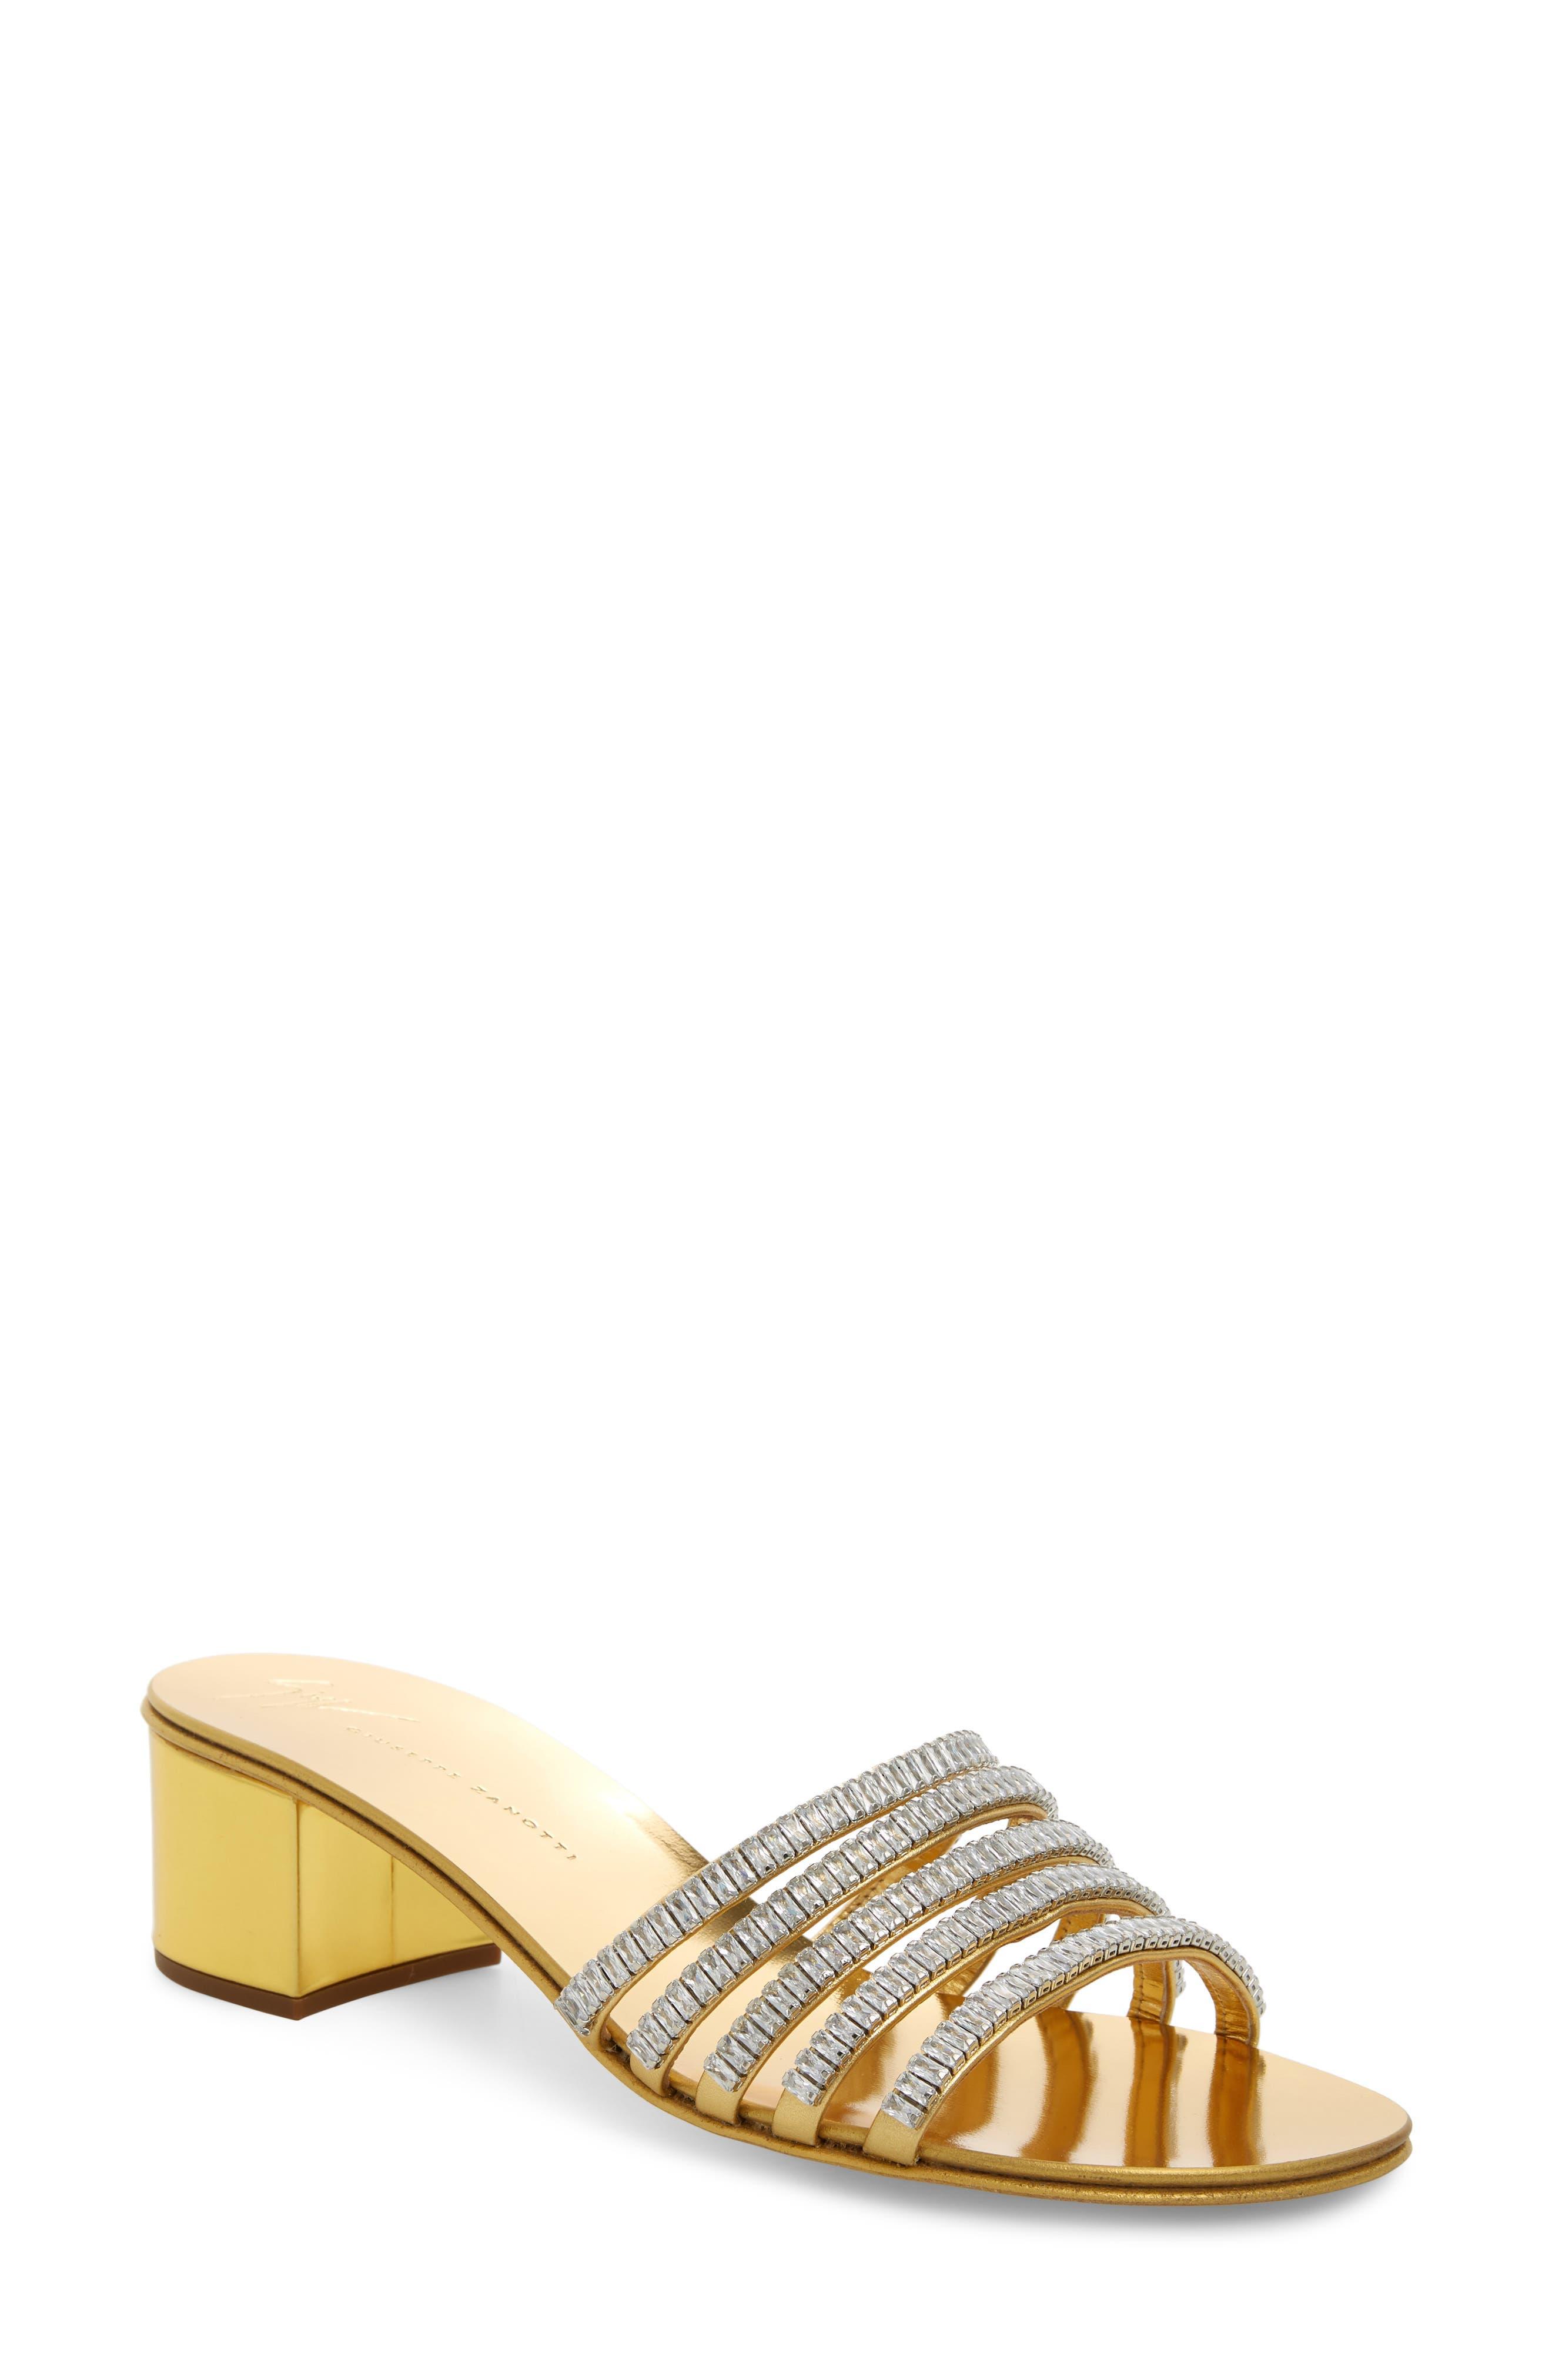 Giuseppe Zanotti Crystal Embellished Slide Sandal- Metallic